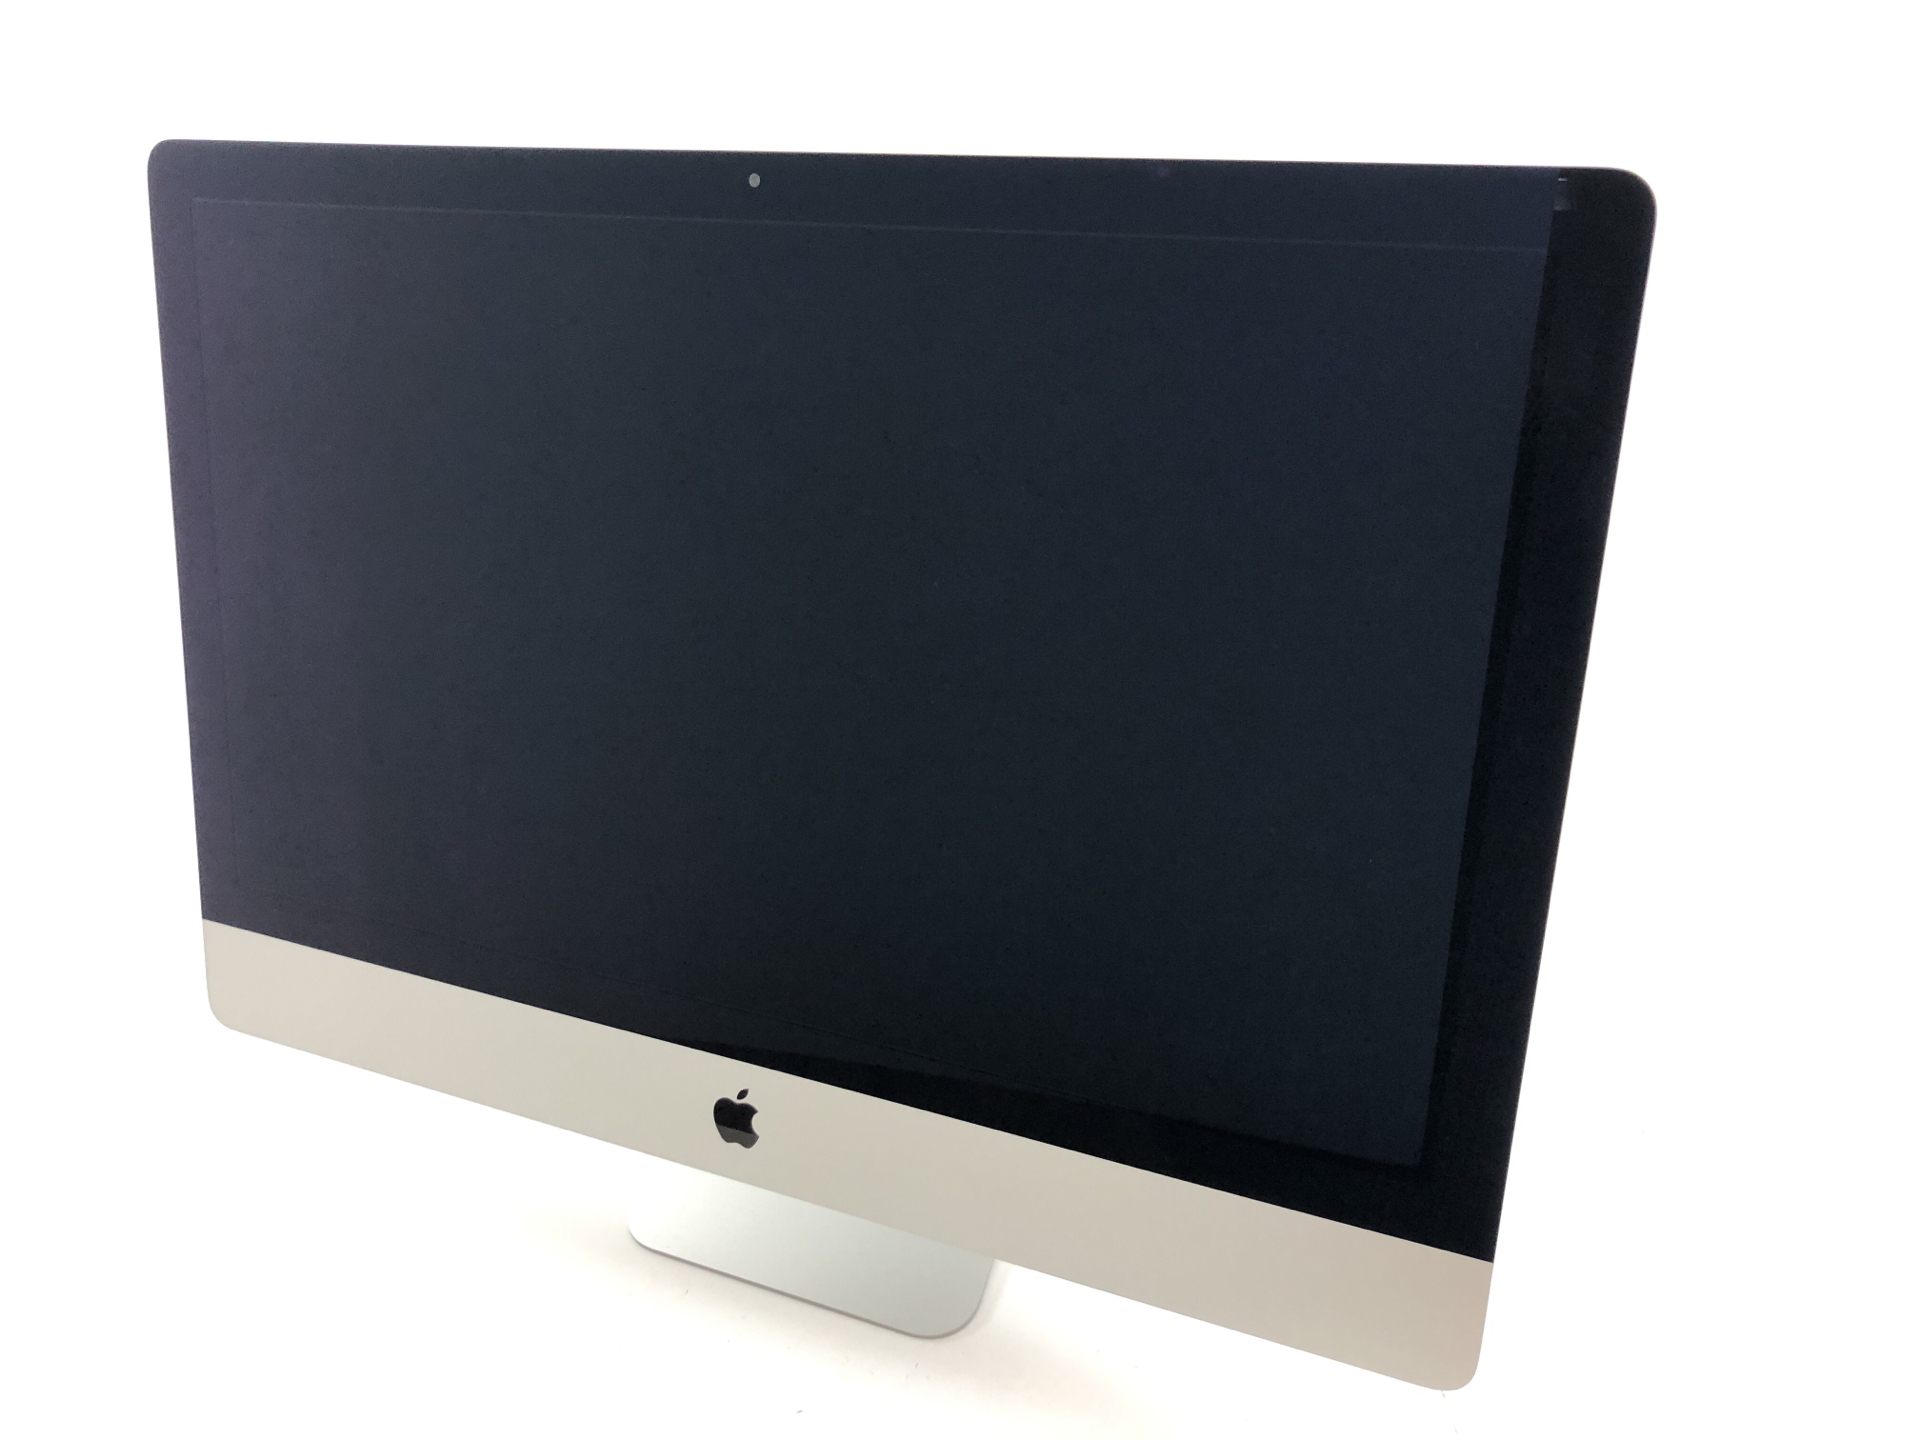 "iMac 27"" Late 2012 (Intel Quad-Core i7 3.4 GHz 32 GB RAM 512 GB SSD), Intel Quad-Core i7 3.4 GHz, 32 GB RAM, 1TB SSD, Kuva 1"